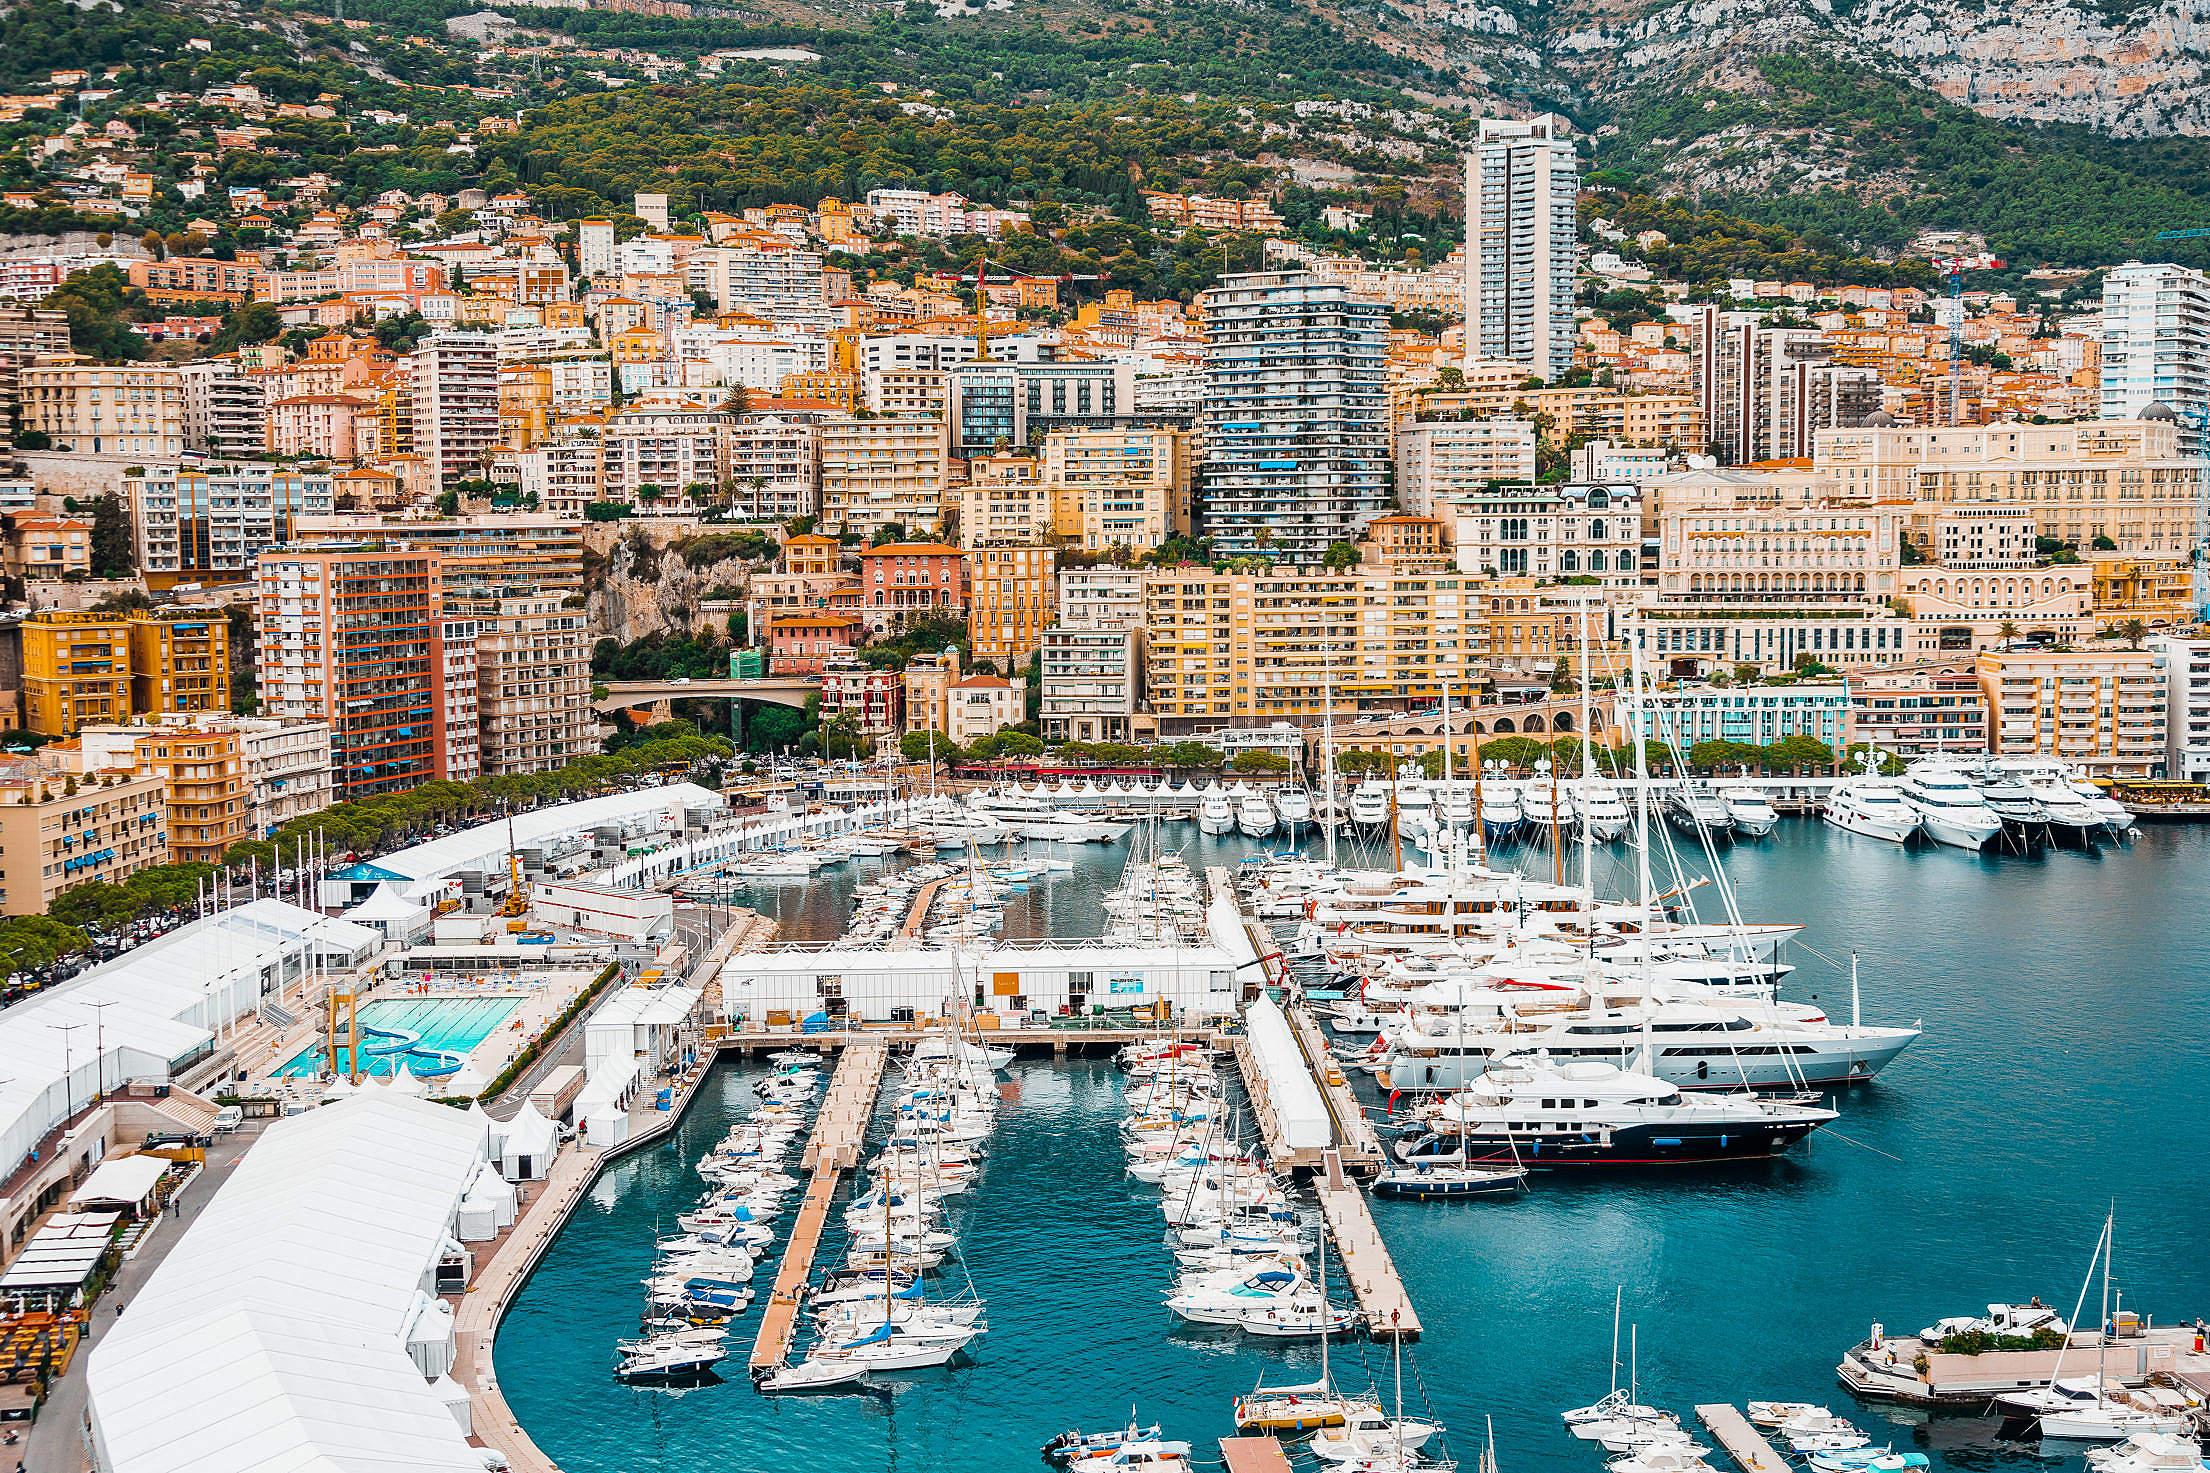 Preparations for Monaco Yacht Show in Port Hercule, Monaco Free Stock Photo